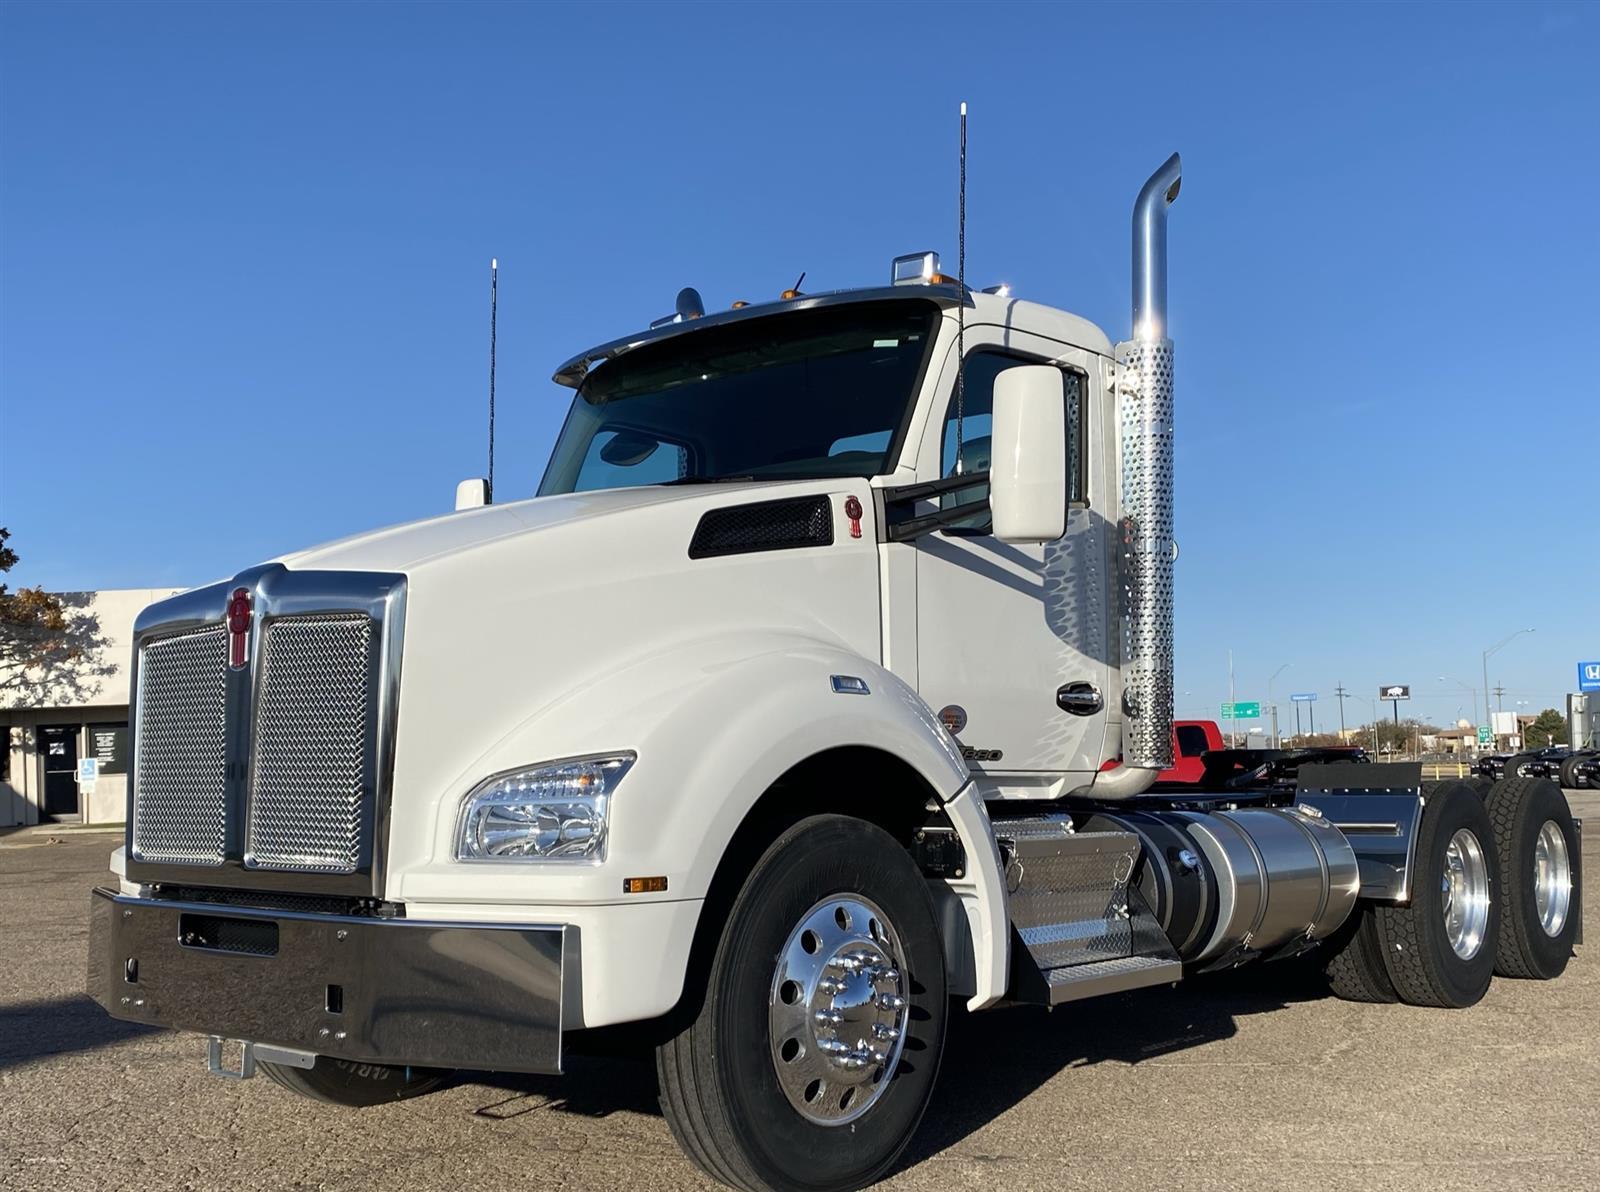 2020 Kenworth T880 6x4, Tractor #LJ374095 - photo 1